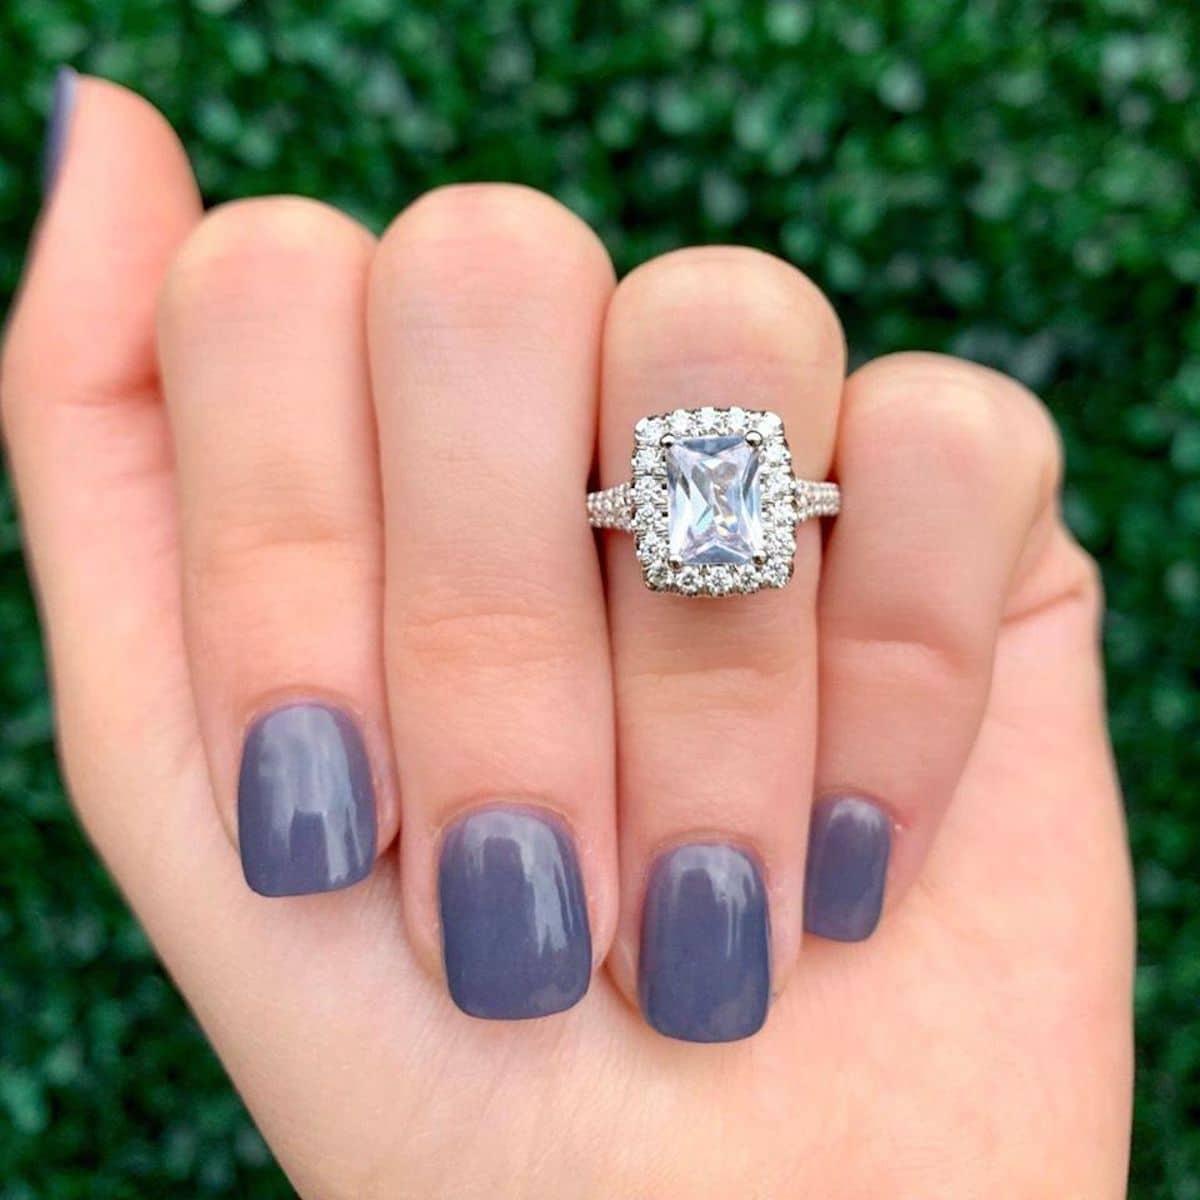 Score 20% off designer jewelry during the Diamonds Direct Winter Showcase in Birmingham, Nov. 22-24